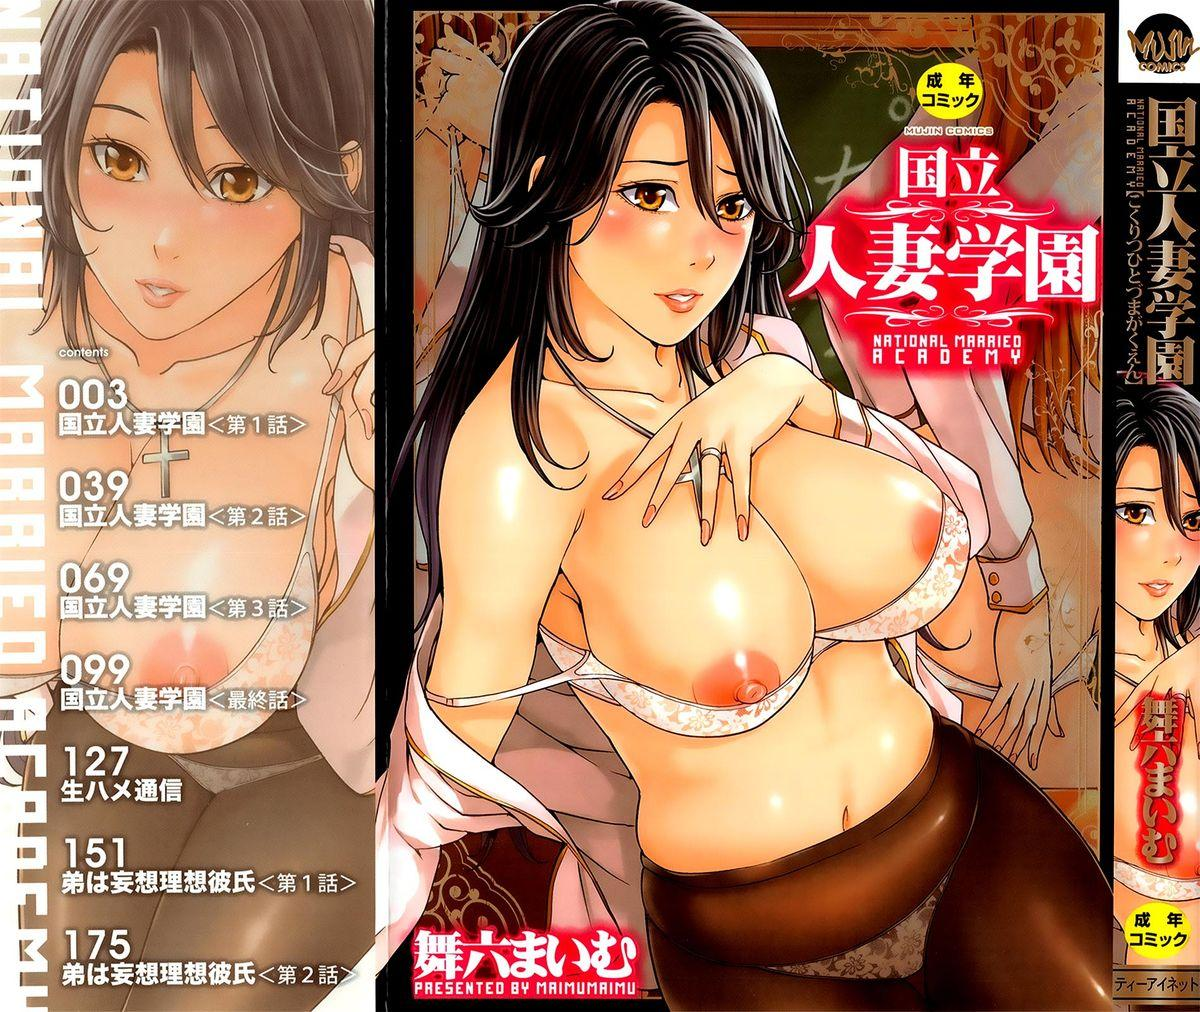 Kokuritsu Hitozuma Gakuen - National Married Academy 0